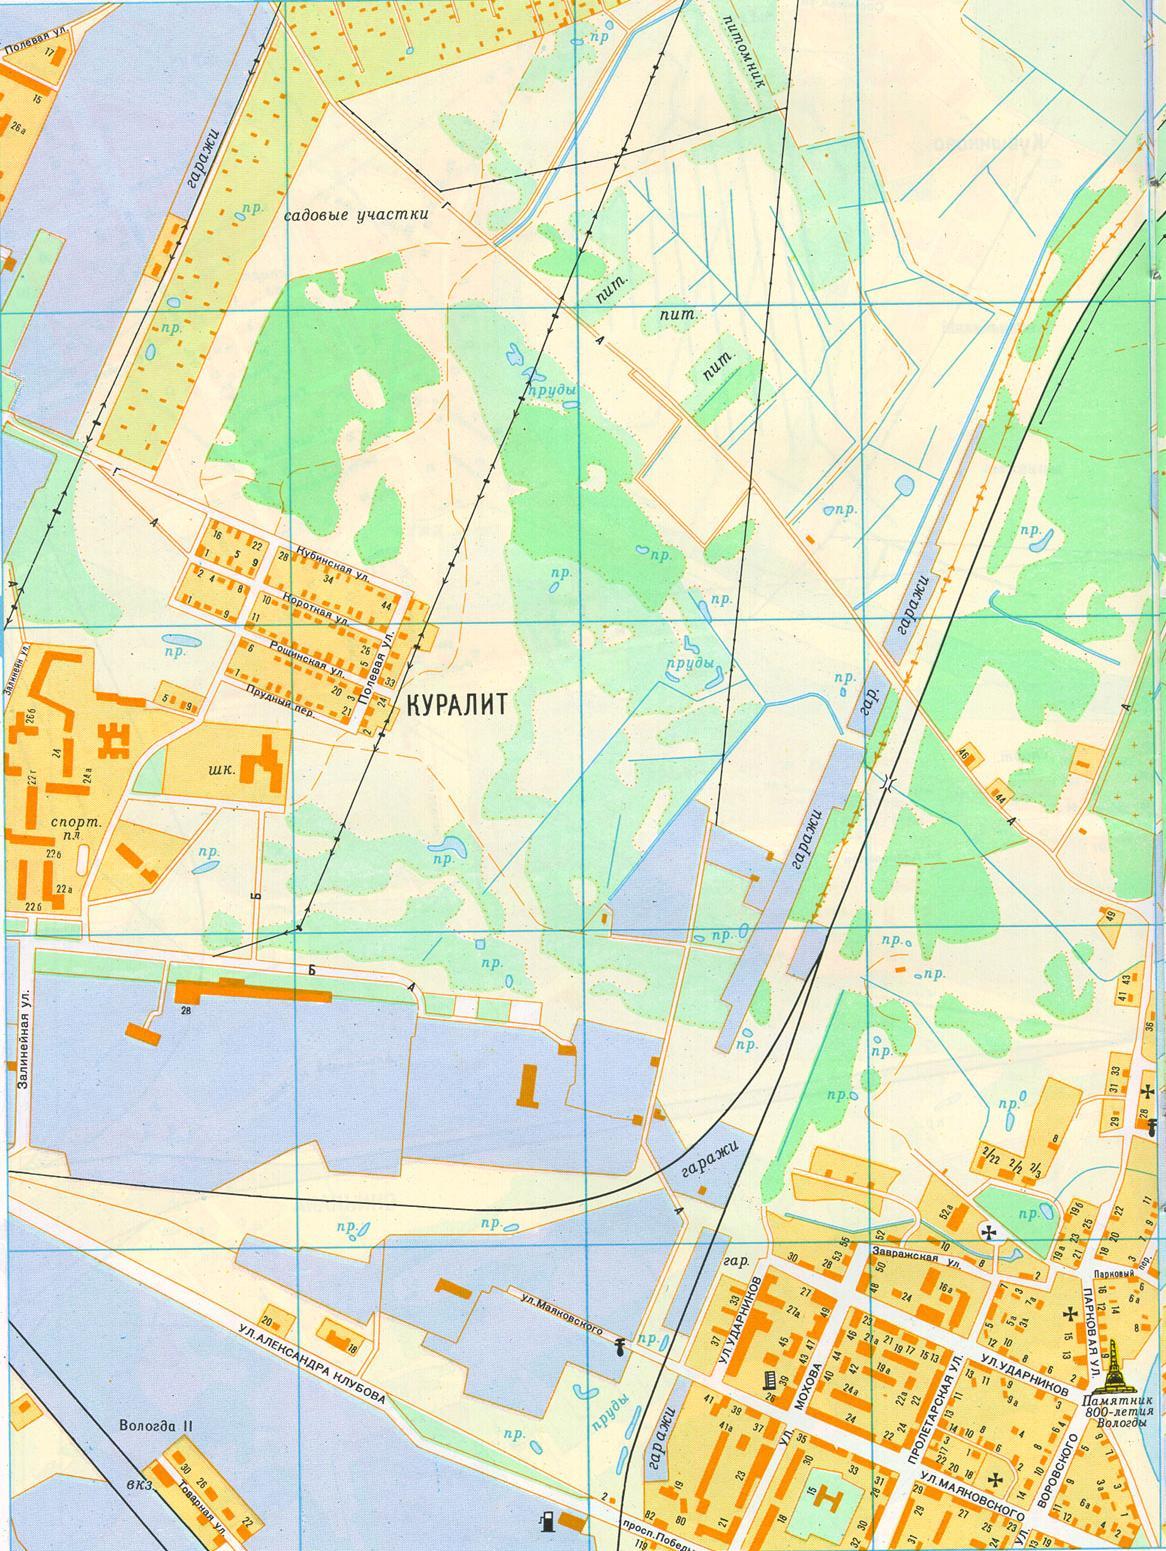 Карта Вологодской Области Навител 5 - instrukciyadate: http://instrukciyadate.weebly.com/blog/karta-vologodskoj-oblasti-navitel-5